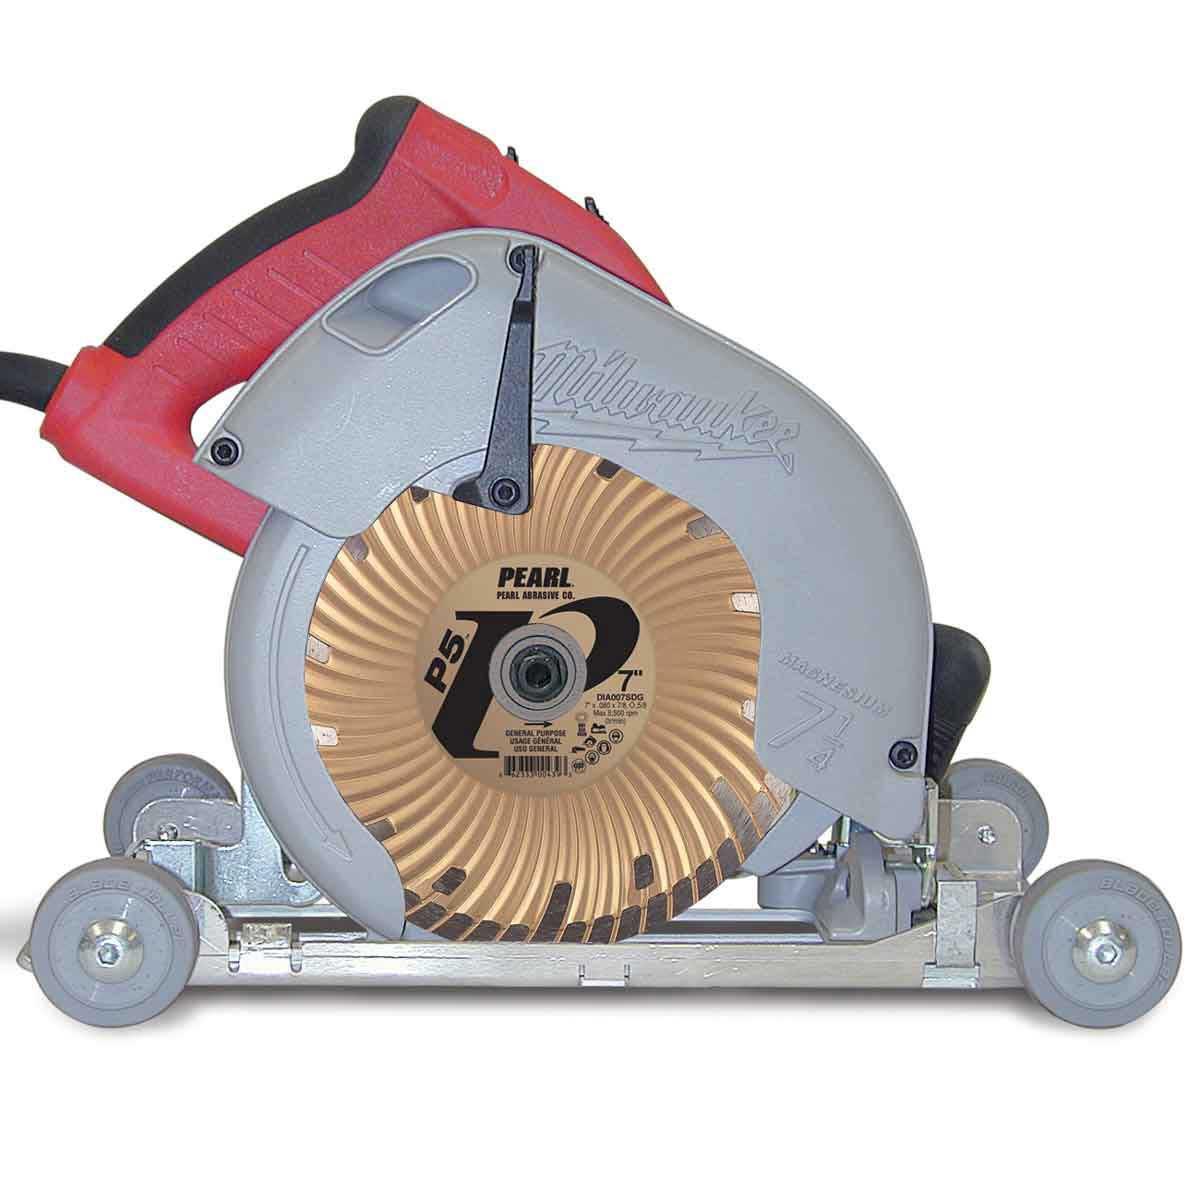 Pearl abrasive roller circular saw